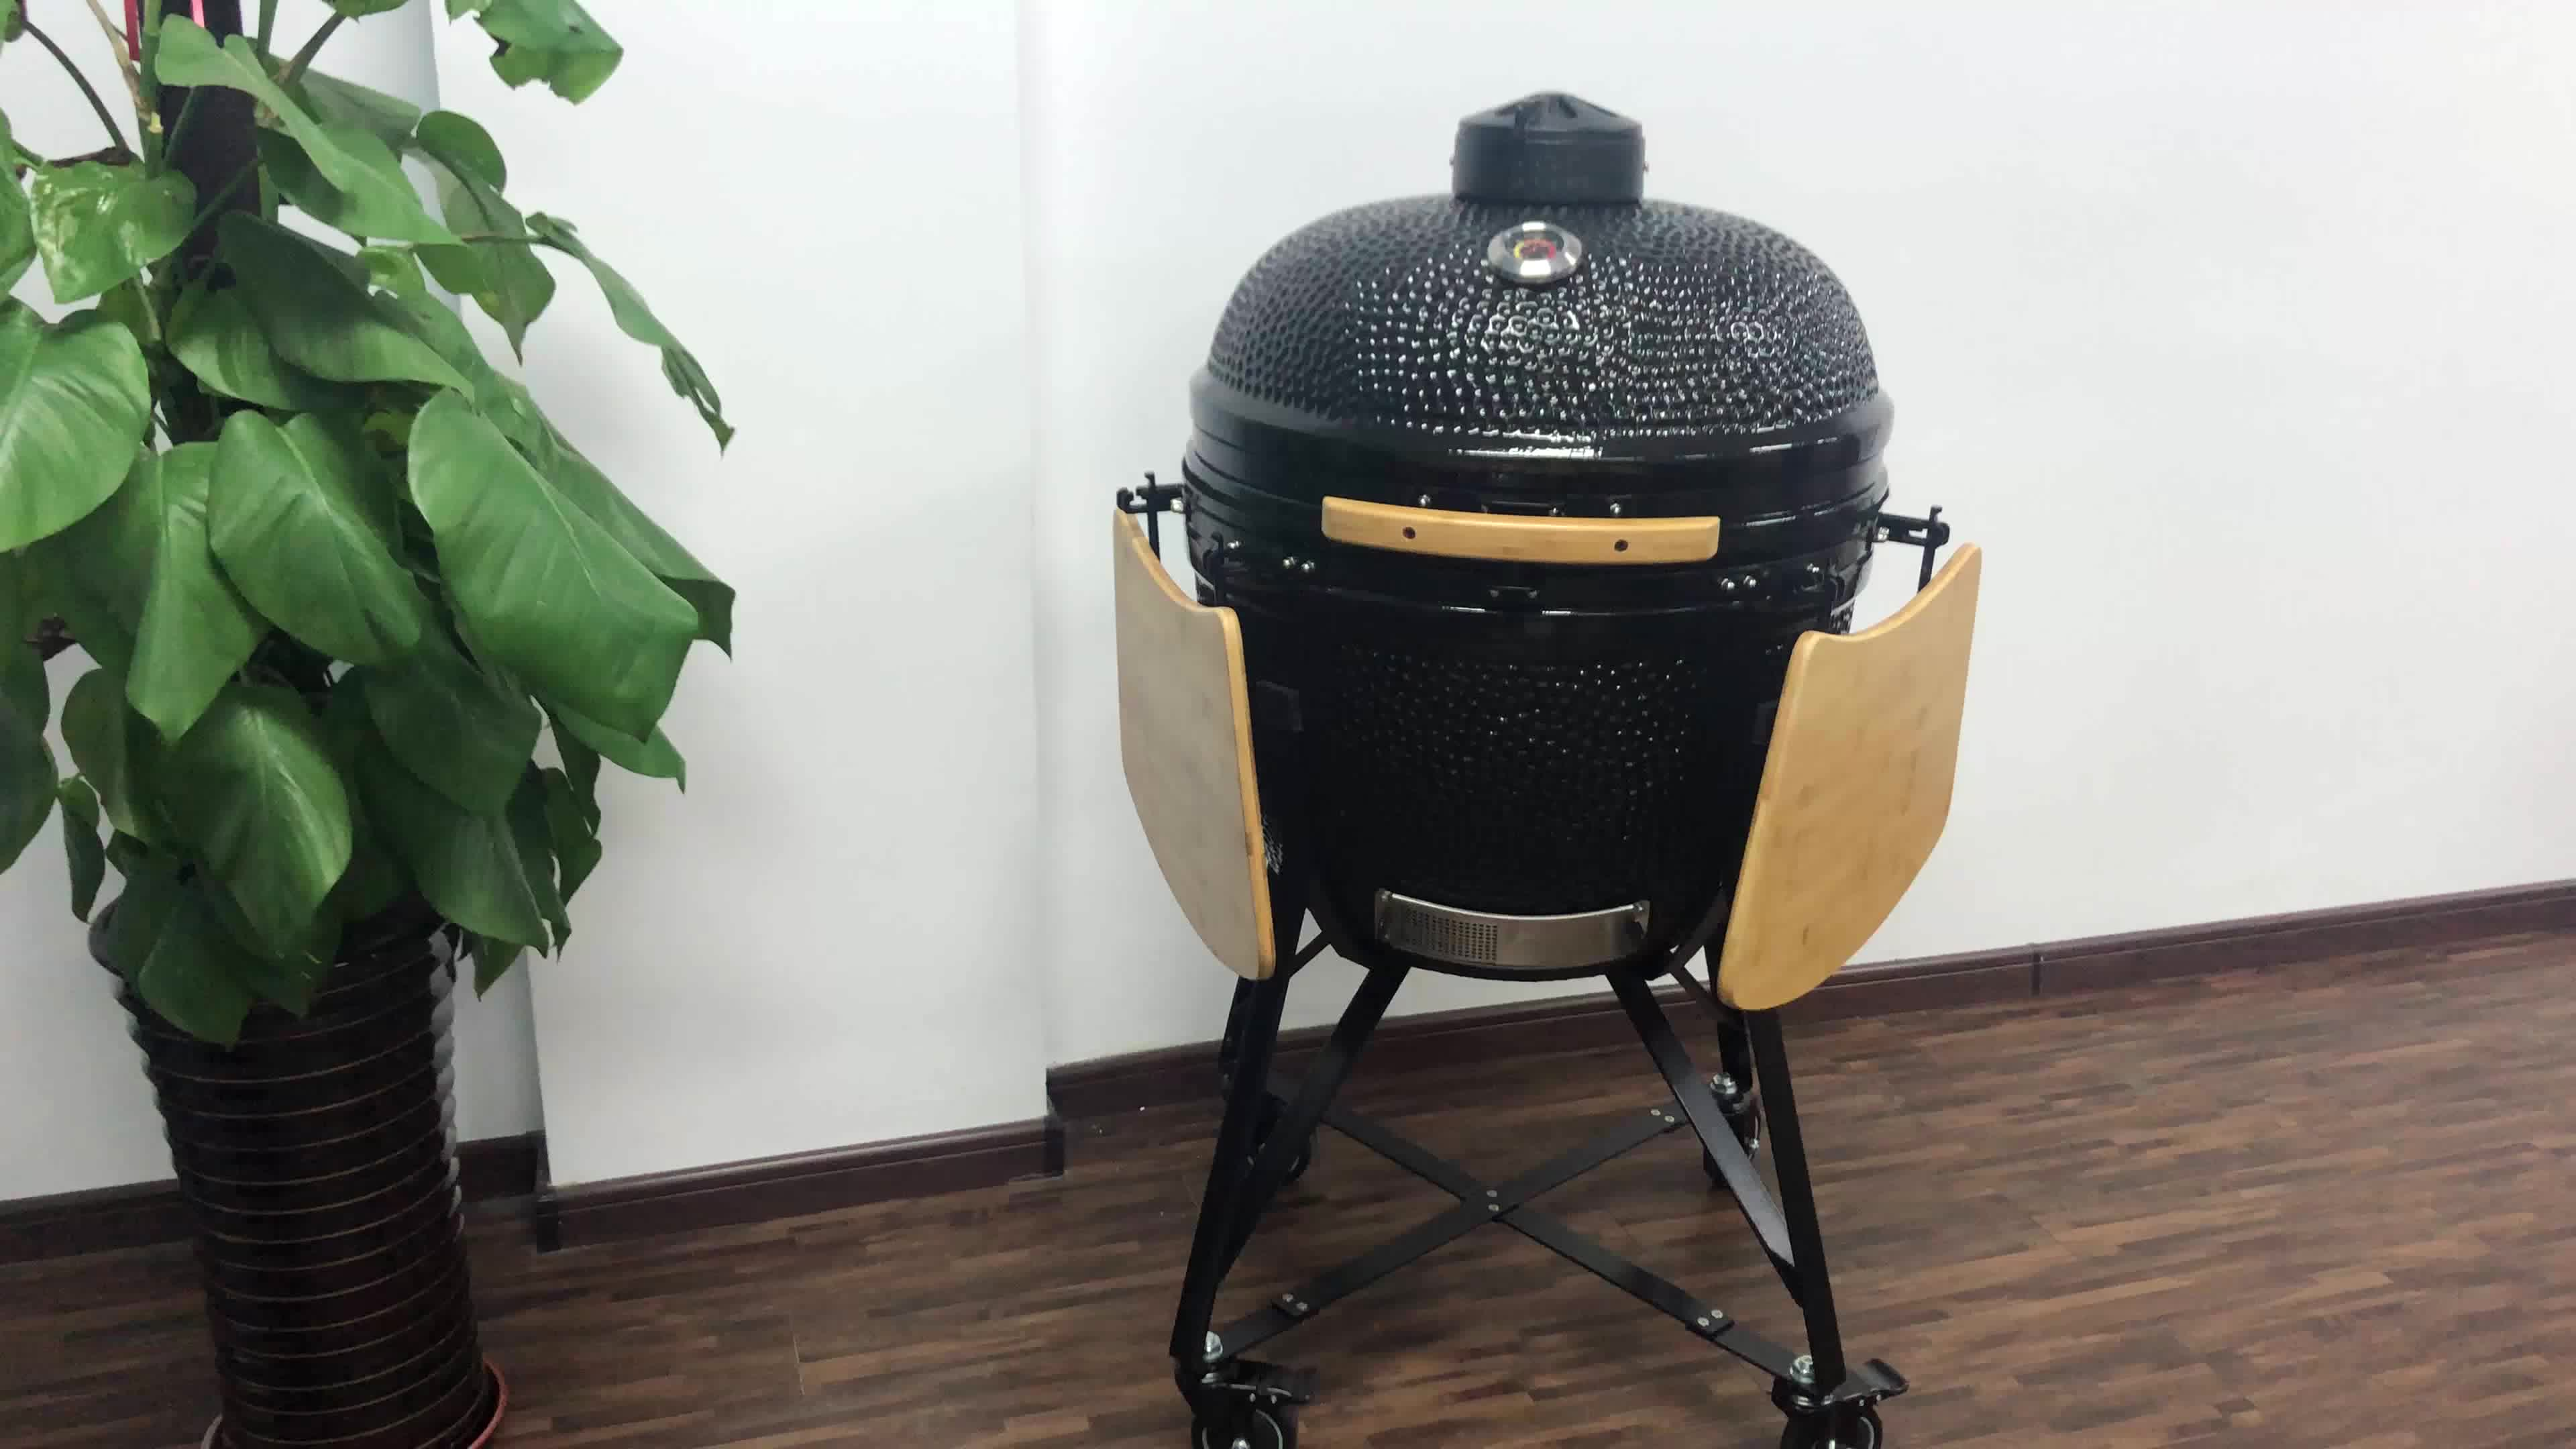 Koken Op Kamado Grill TOPQ Zwart Medium Keramische Grill Roker